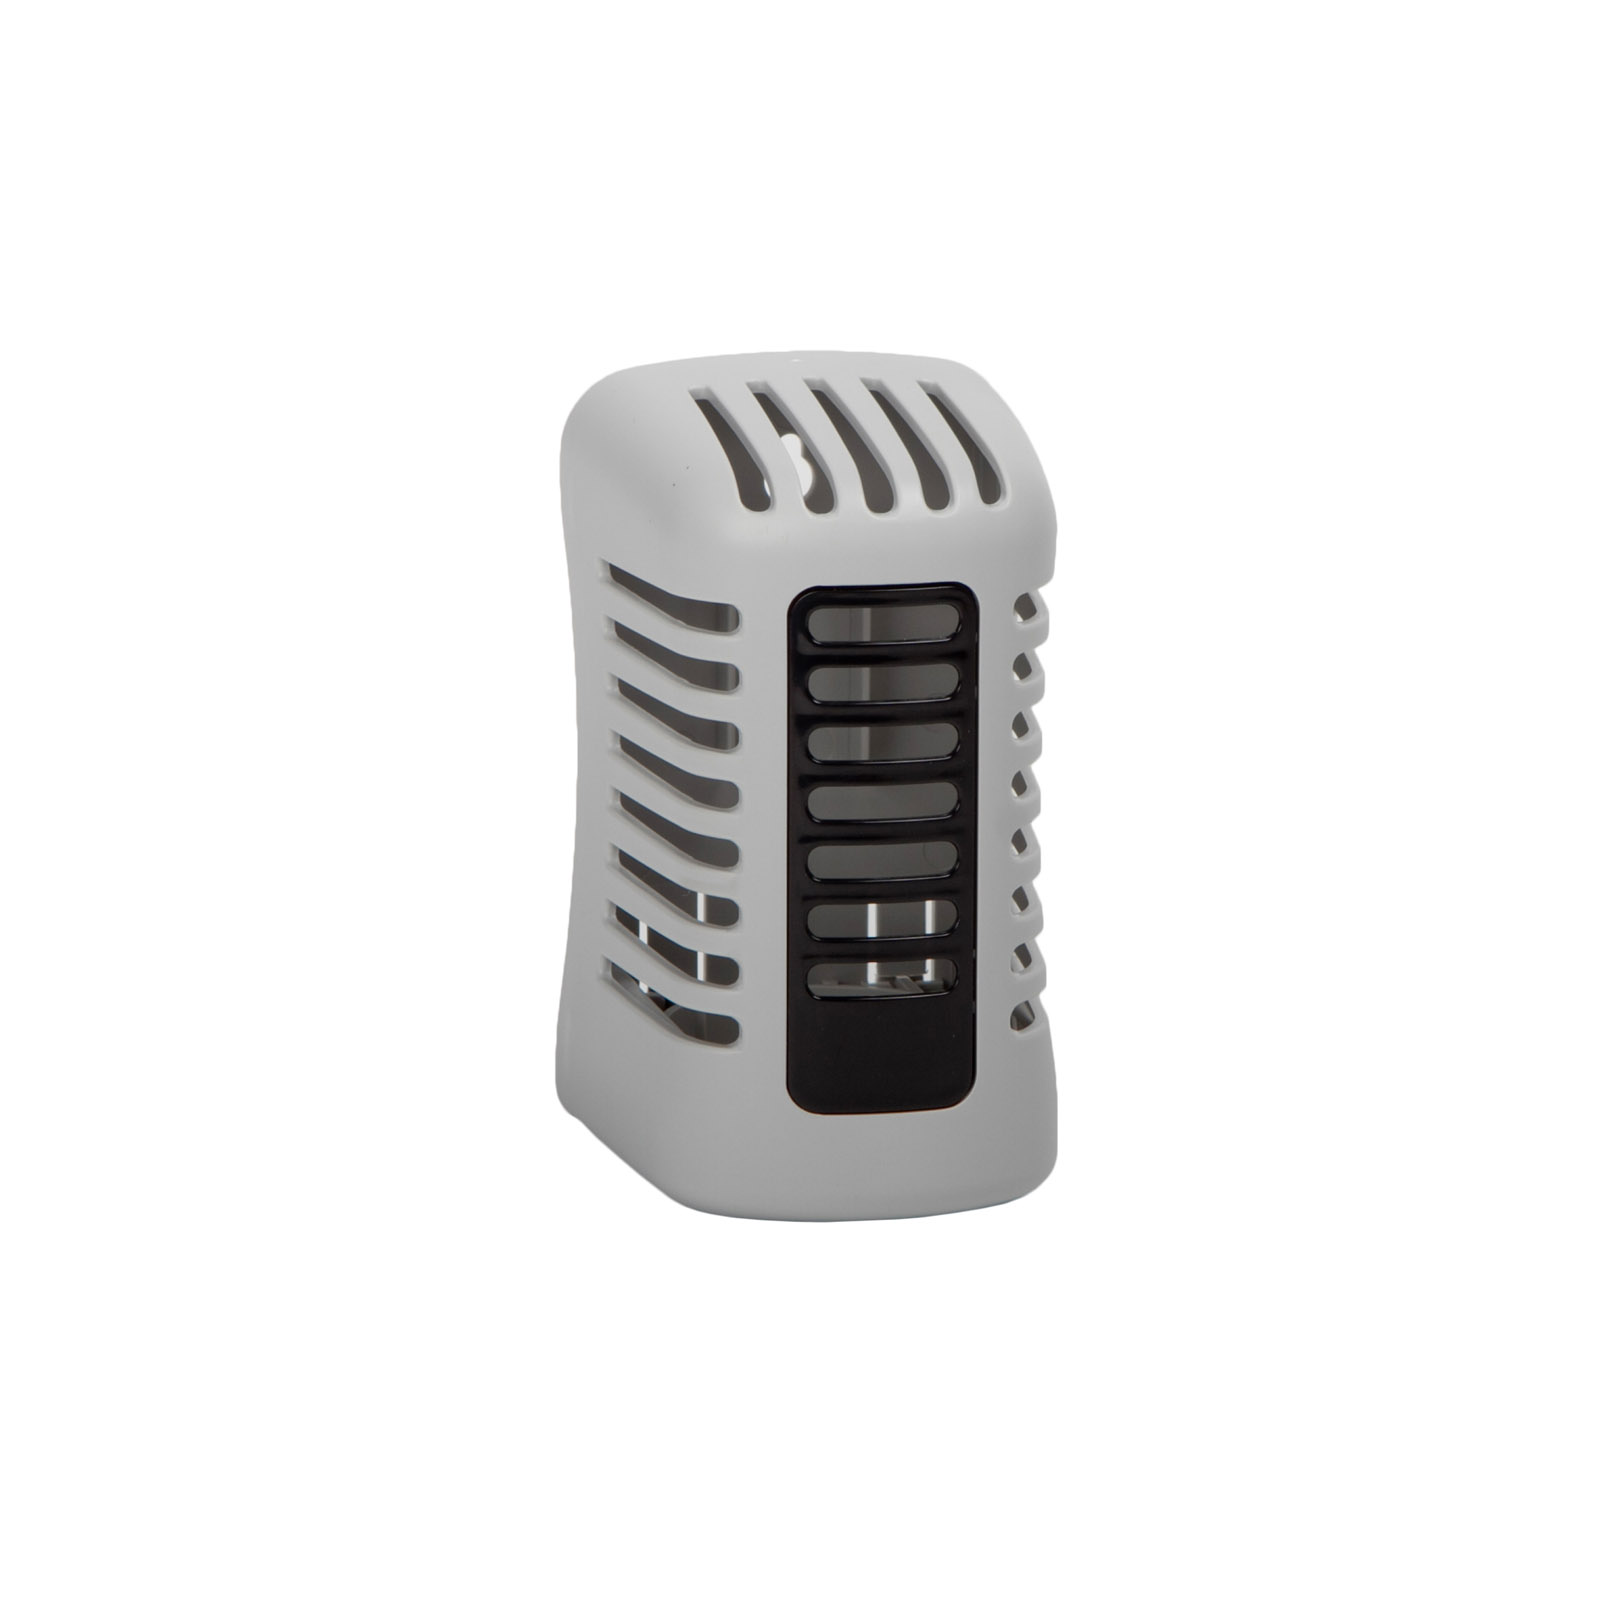 San Jamar WP107801202 air freshener dispenser